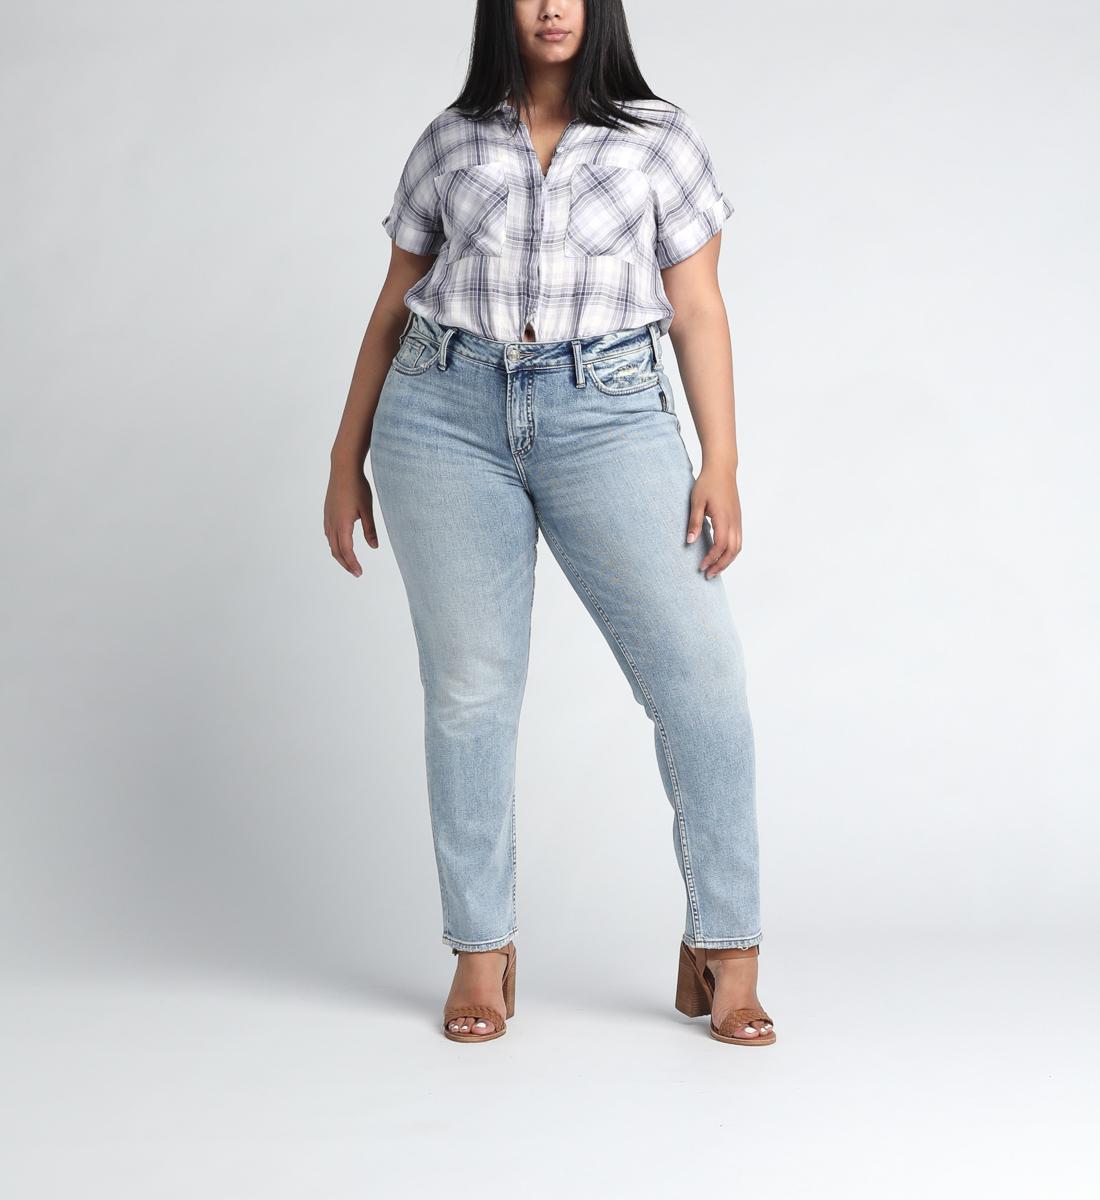 Silver Jeans Elyse Mid Rise Slim Leg Jeans